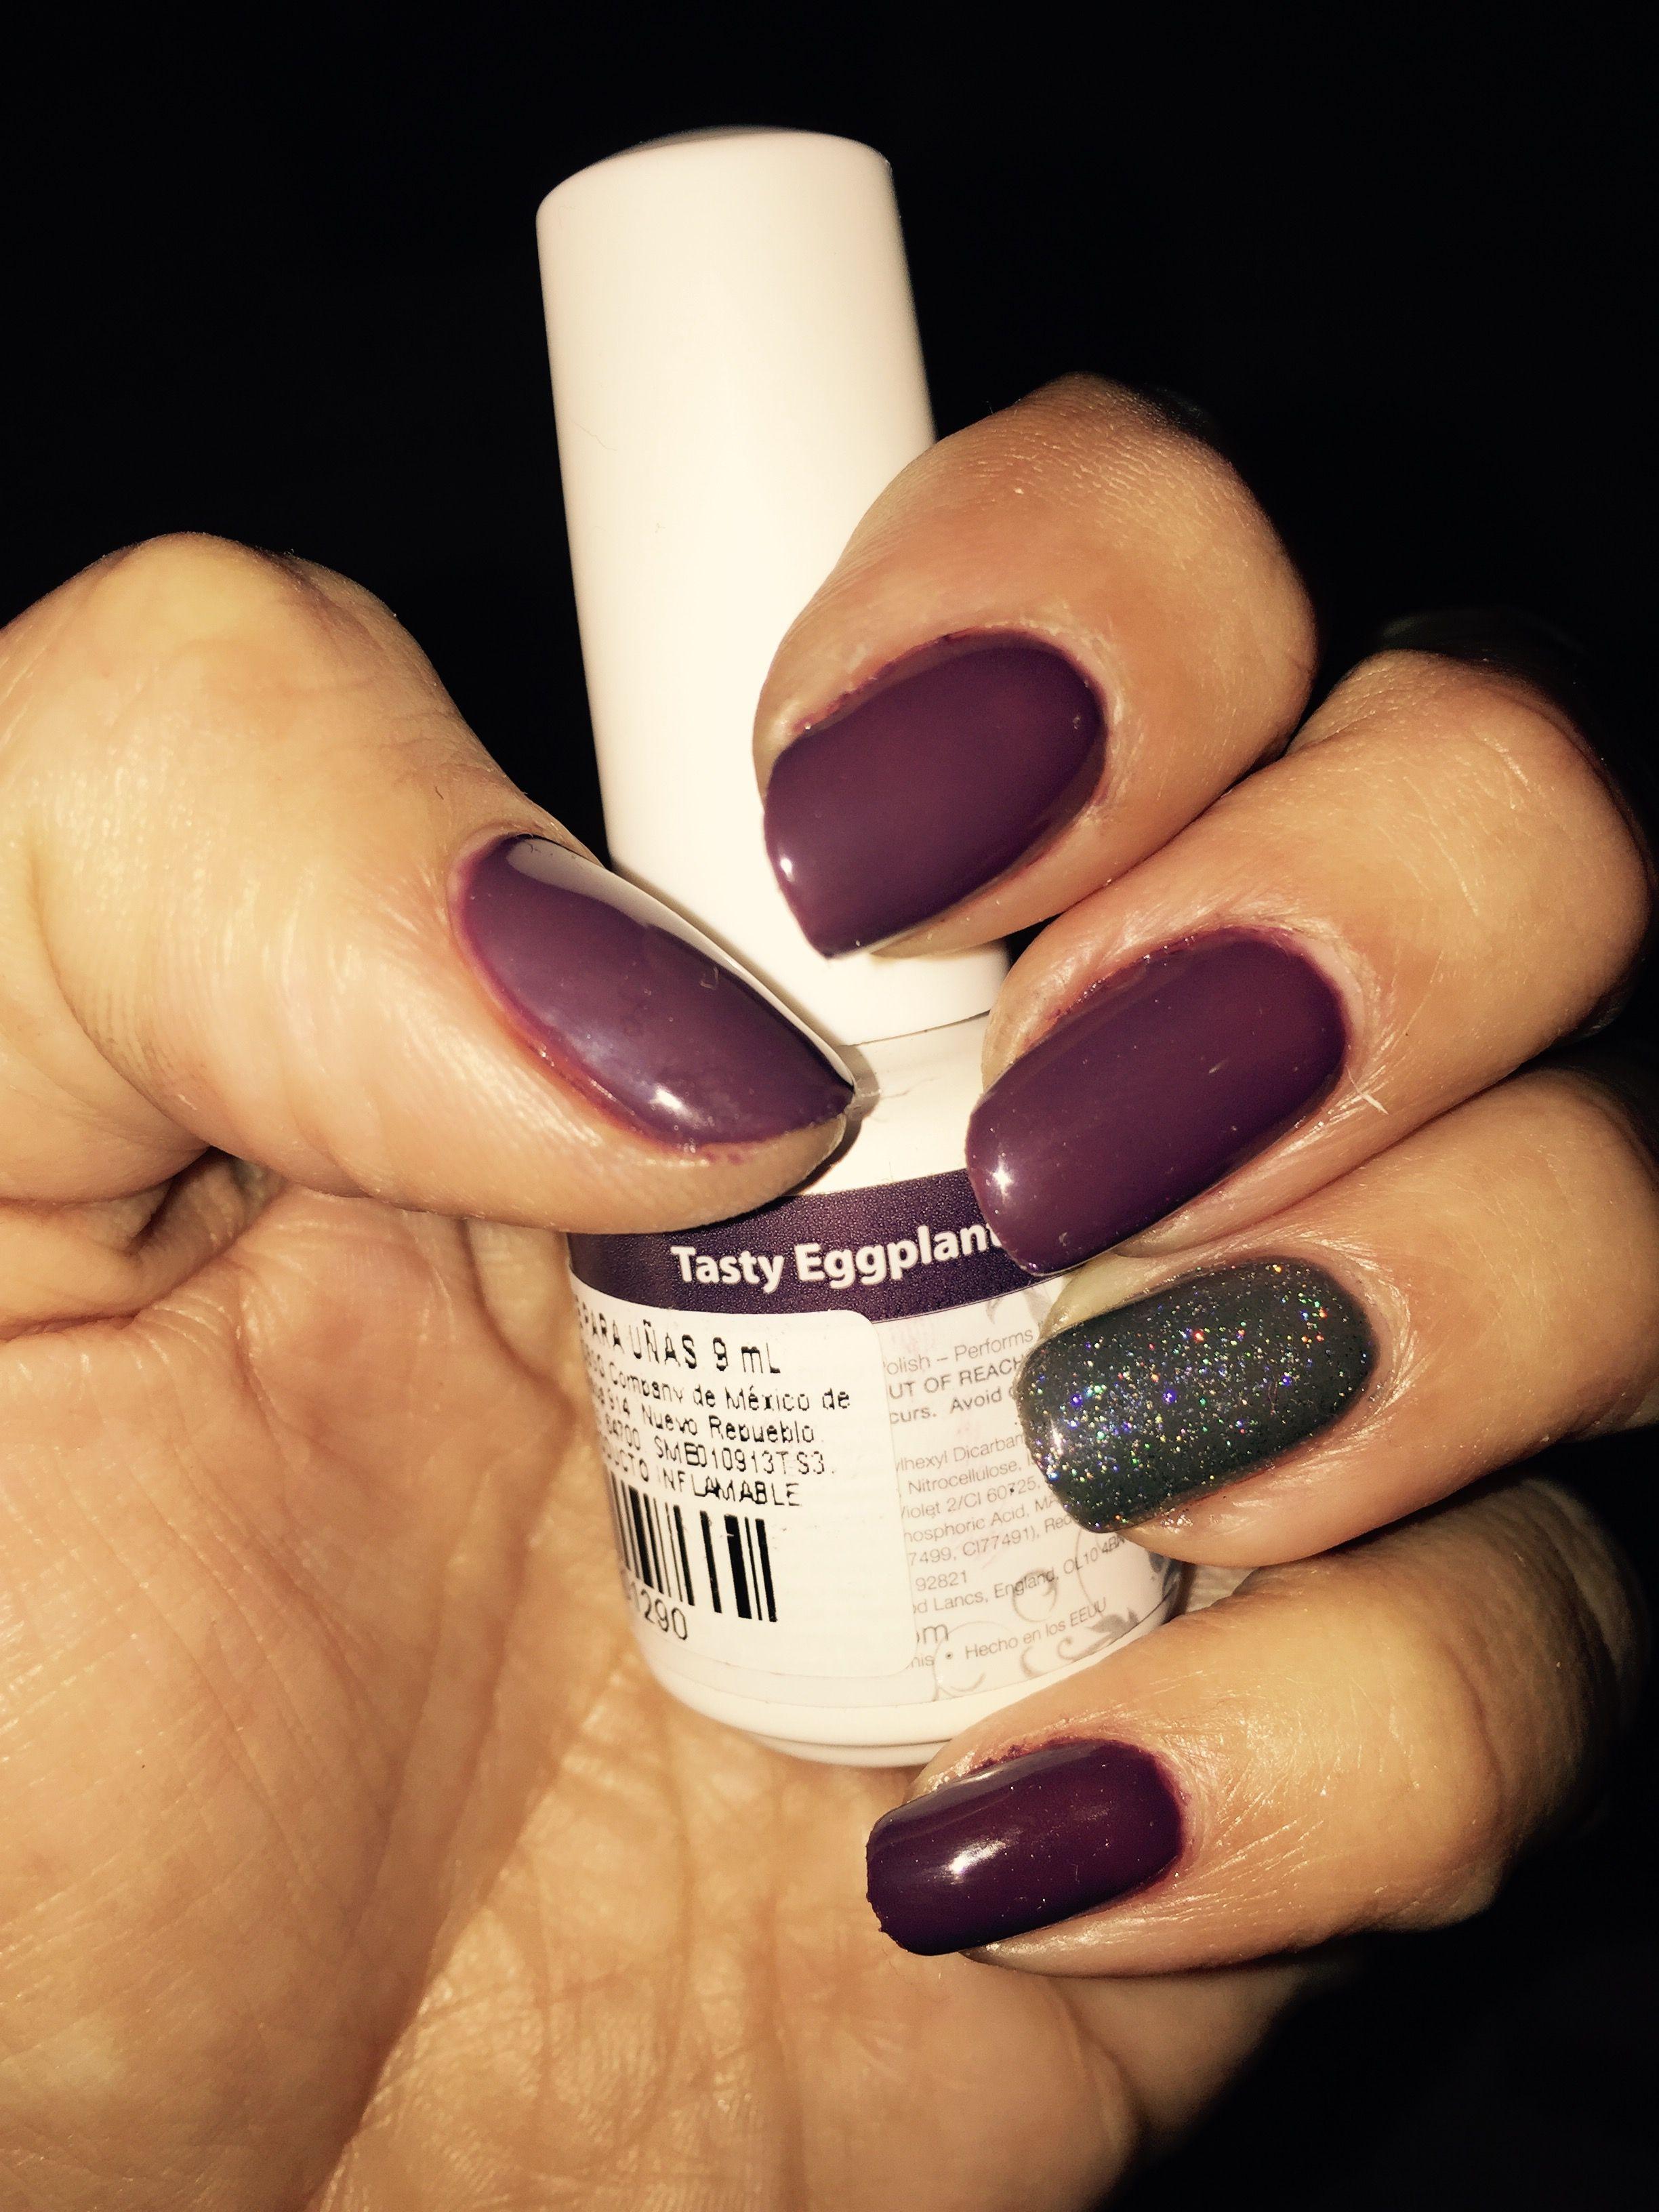 Mi nuevo #Gelish #nails #eggplant | gel polish I have | Pinterest ...